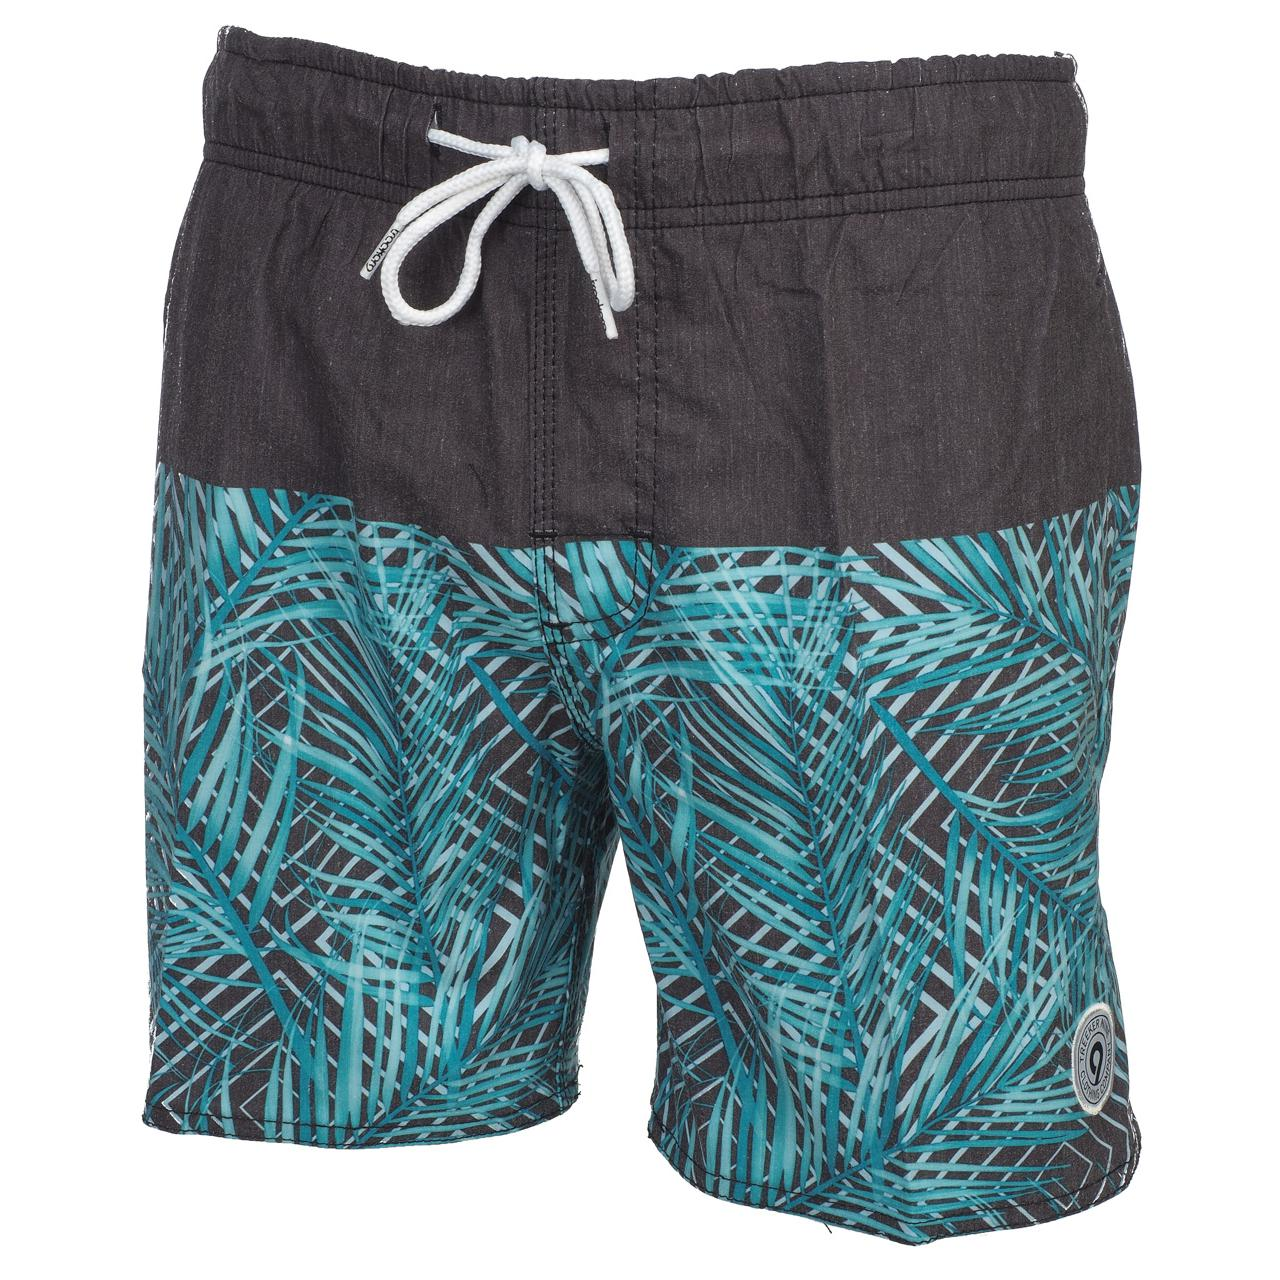 Swimming-Shorts-Treeker9-Agosta-Bath-H-Blue-77749-New